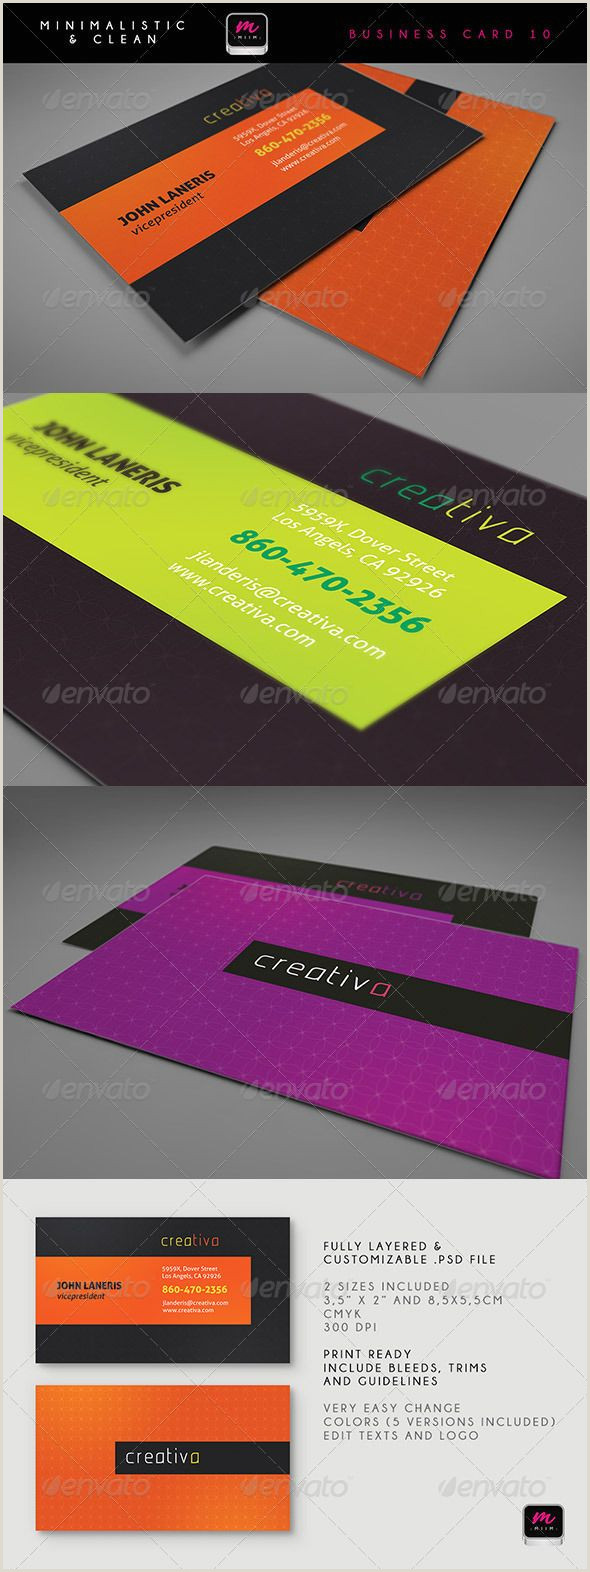 Pinterest Business Cards 100 [ Business Card Print Template ]